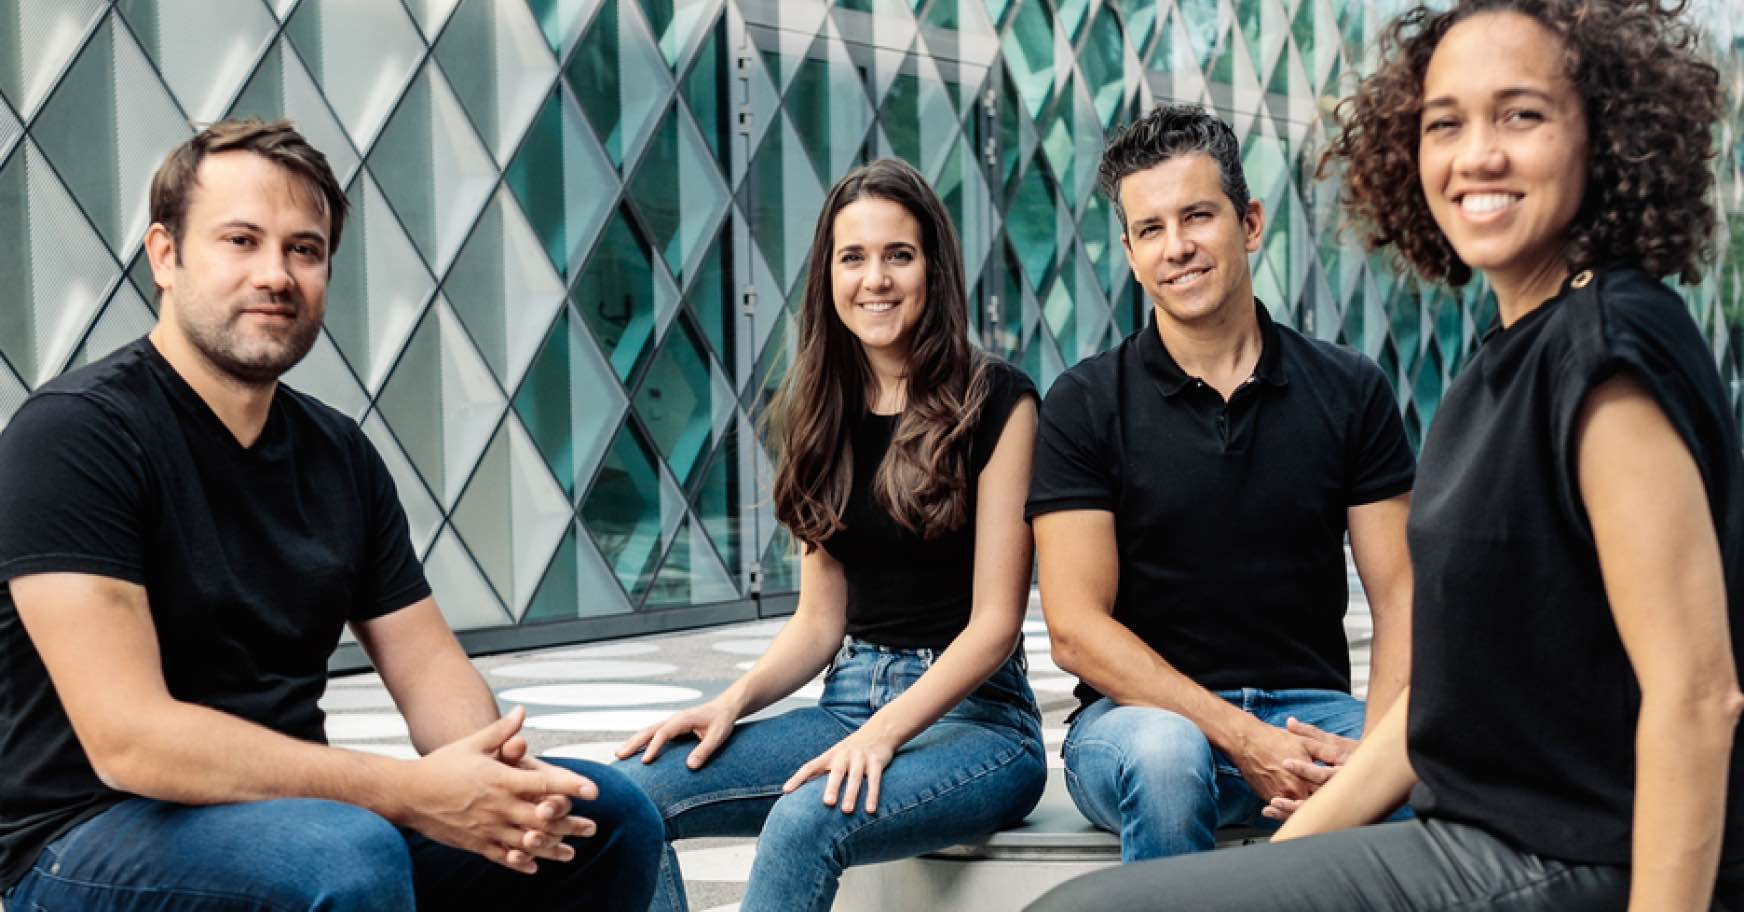 Founding Team of Merantix